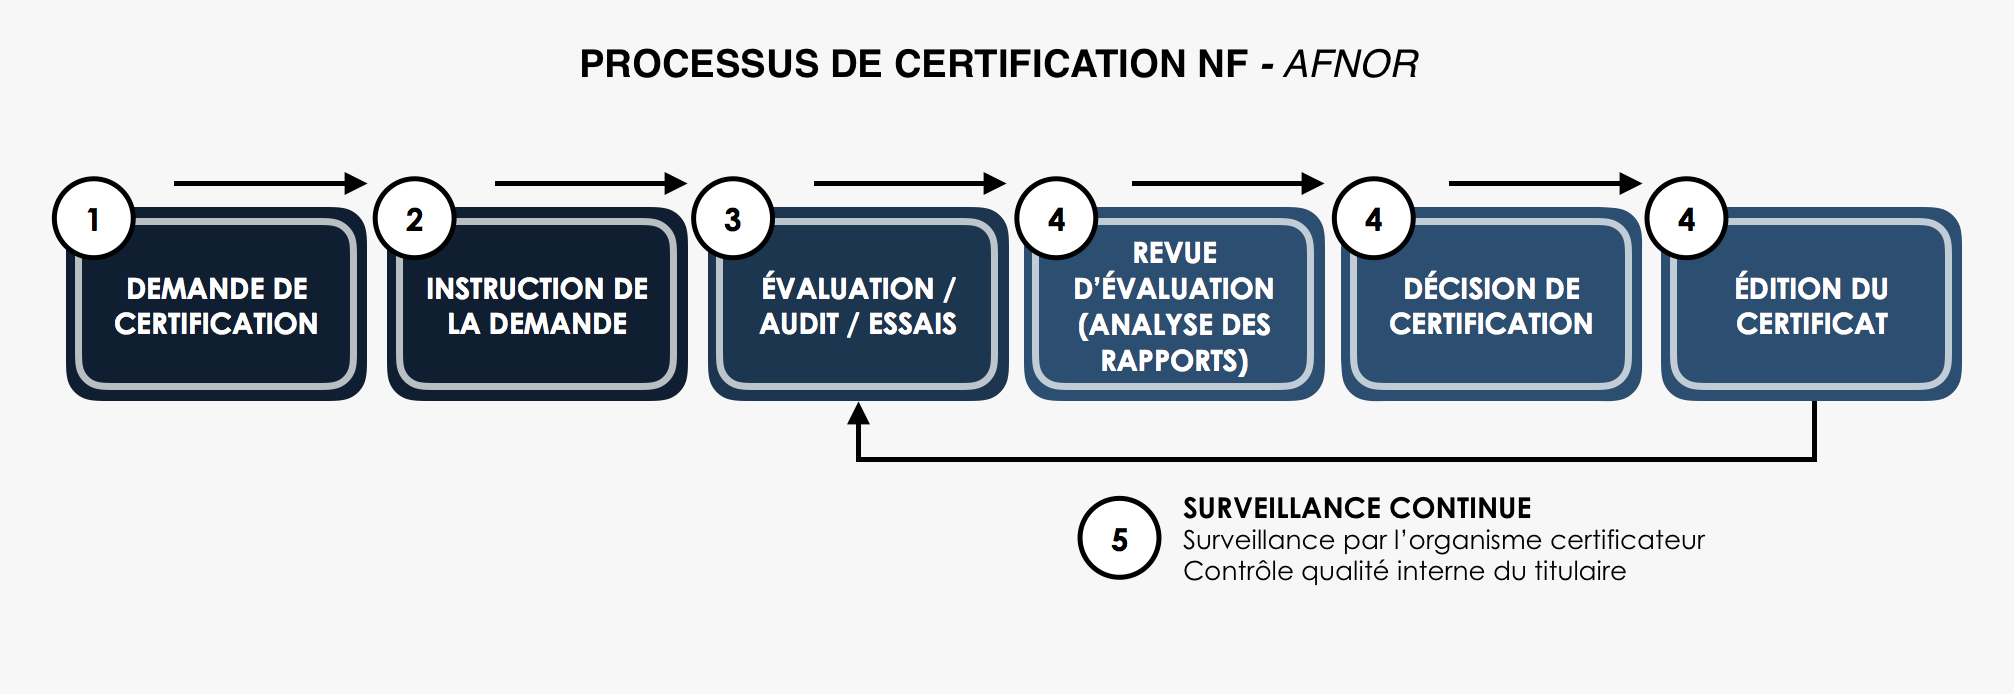 processus certification AFNOR